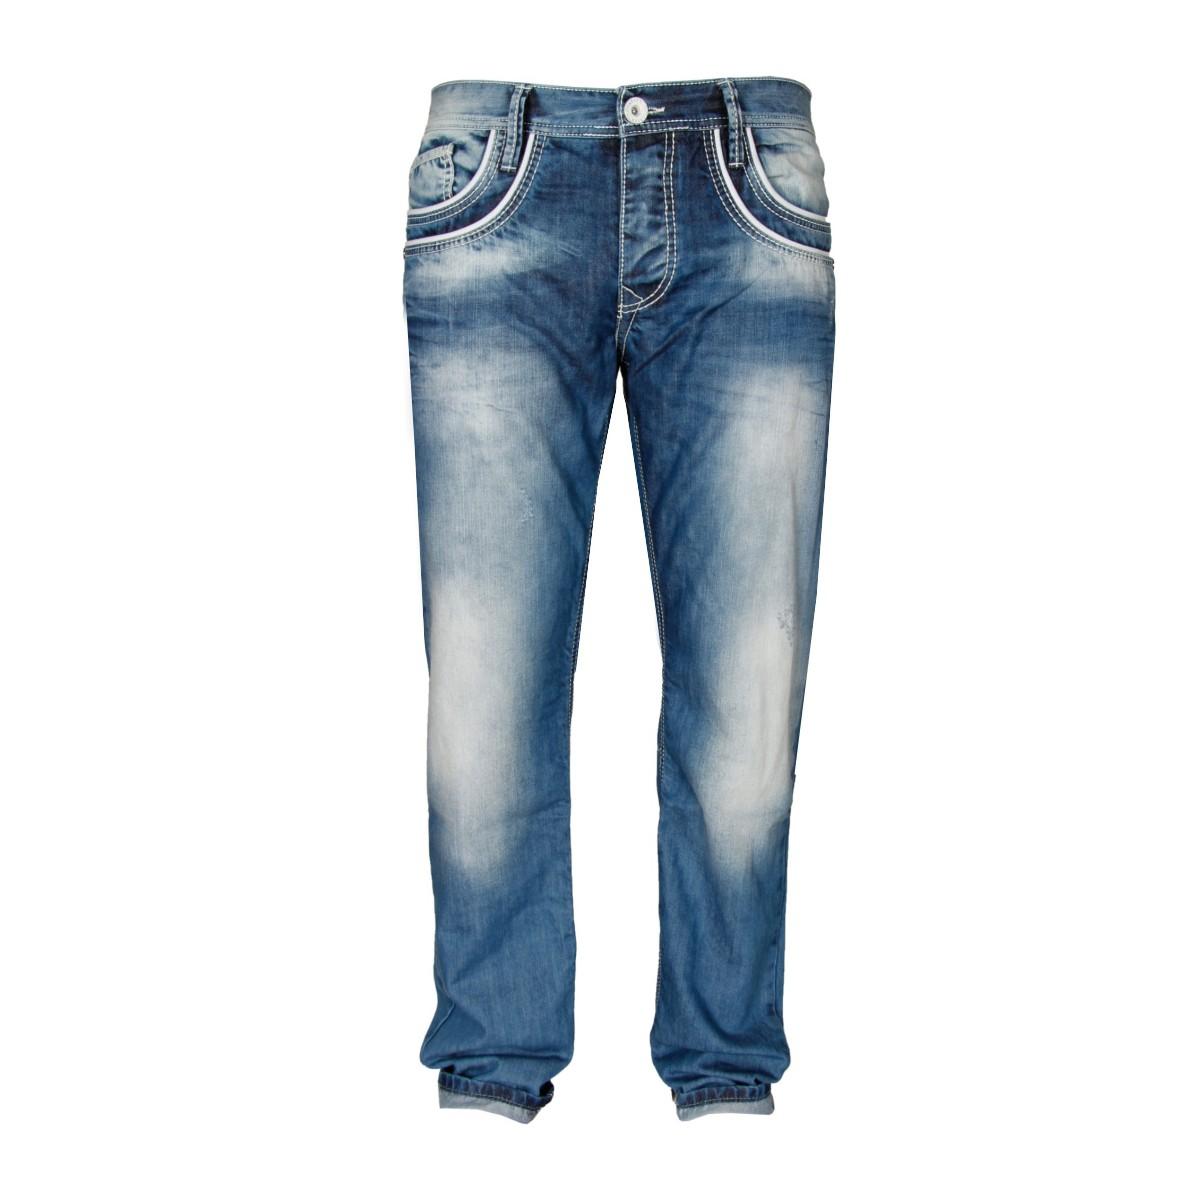 cipo baxx herren jeans white line regular fit blau kaufen jeans direct de. Black Bedroom Furniture Sets. Home Design Ideas